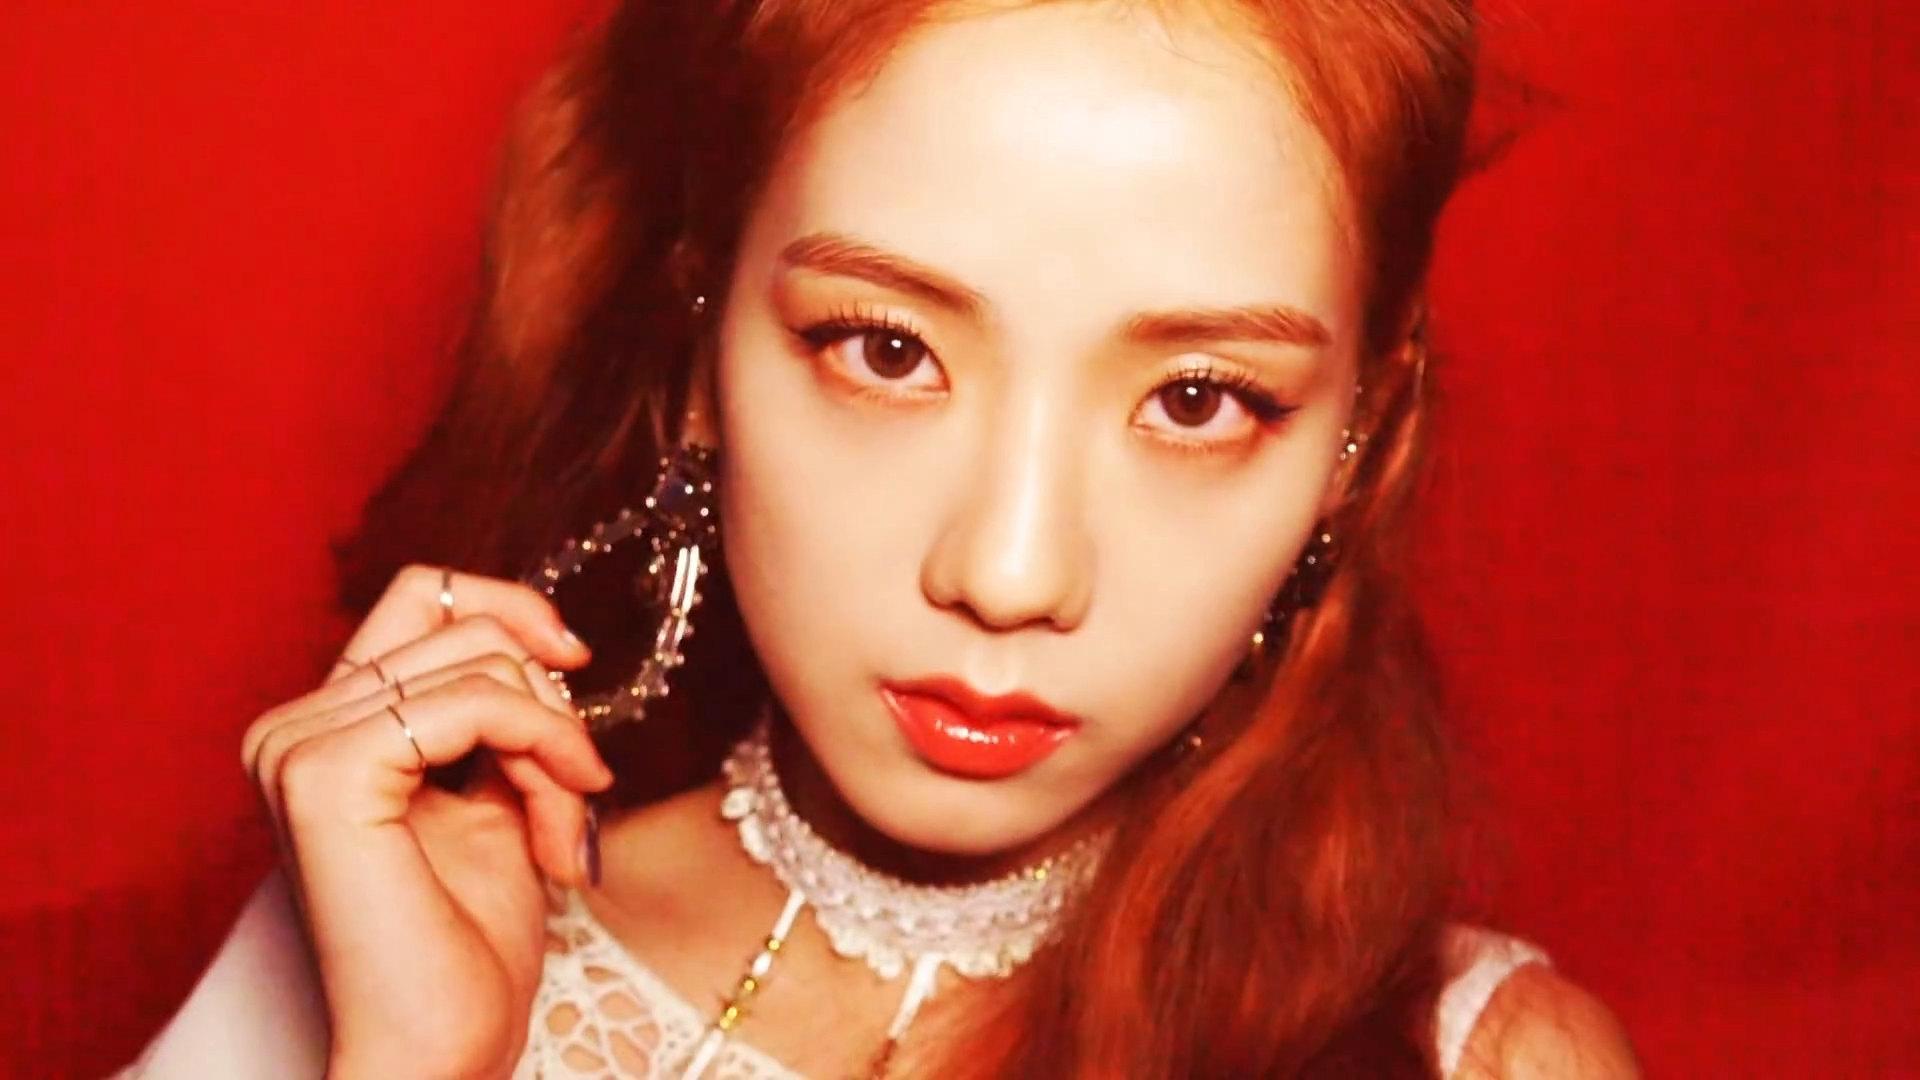 Blackpink – Kill This Love Jisoo Teaser Video Screencaps